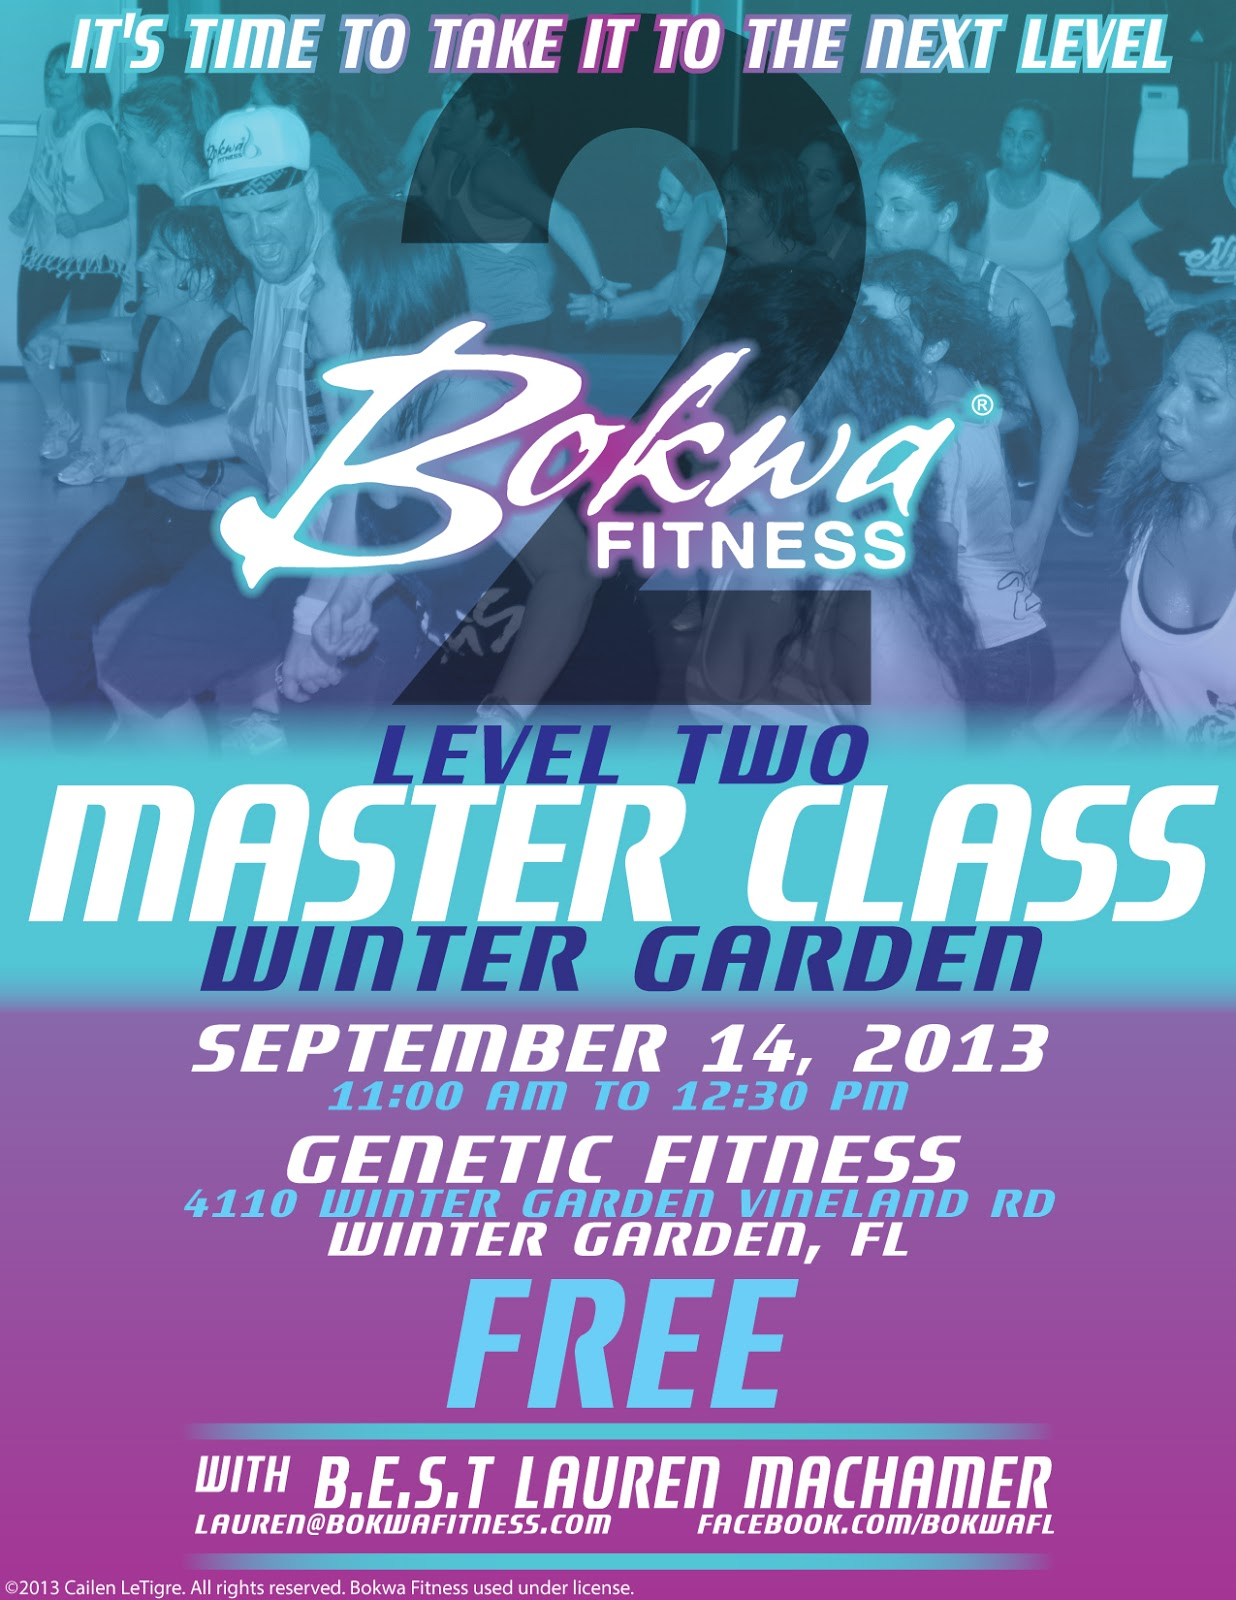 genetic fitness winter garden home design inspirations